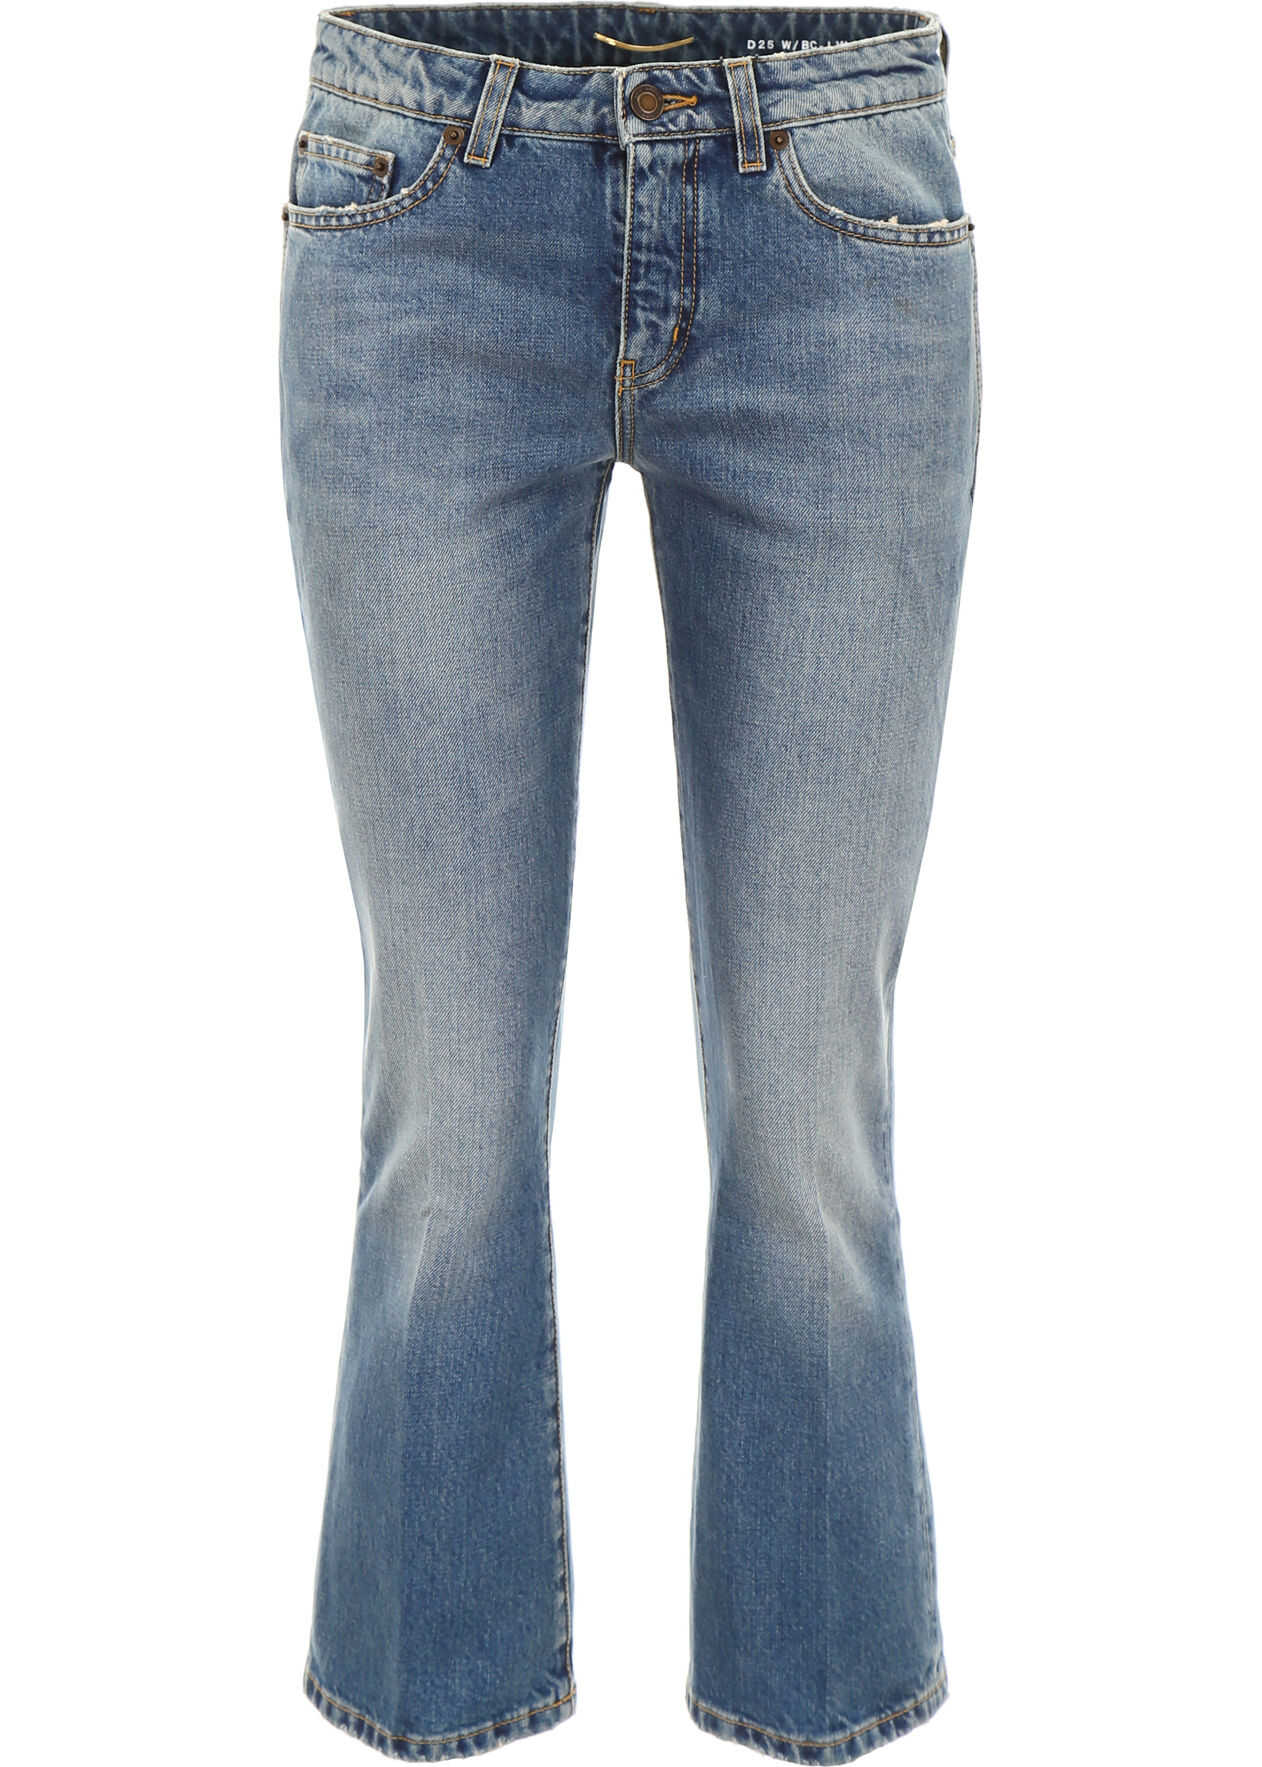 Saint Laurent Vintage Wash Flare Jeans USED 70S BLUE